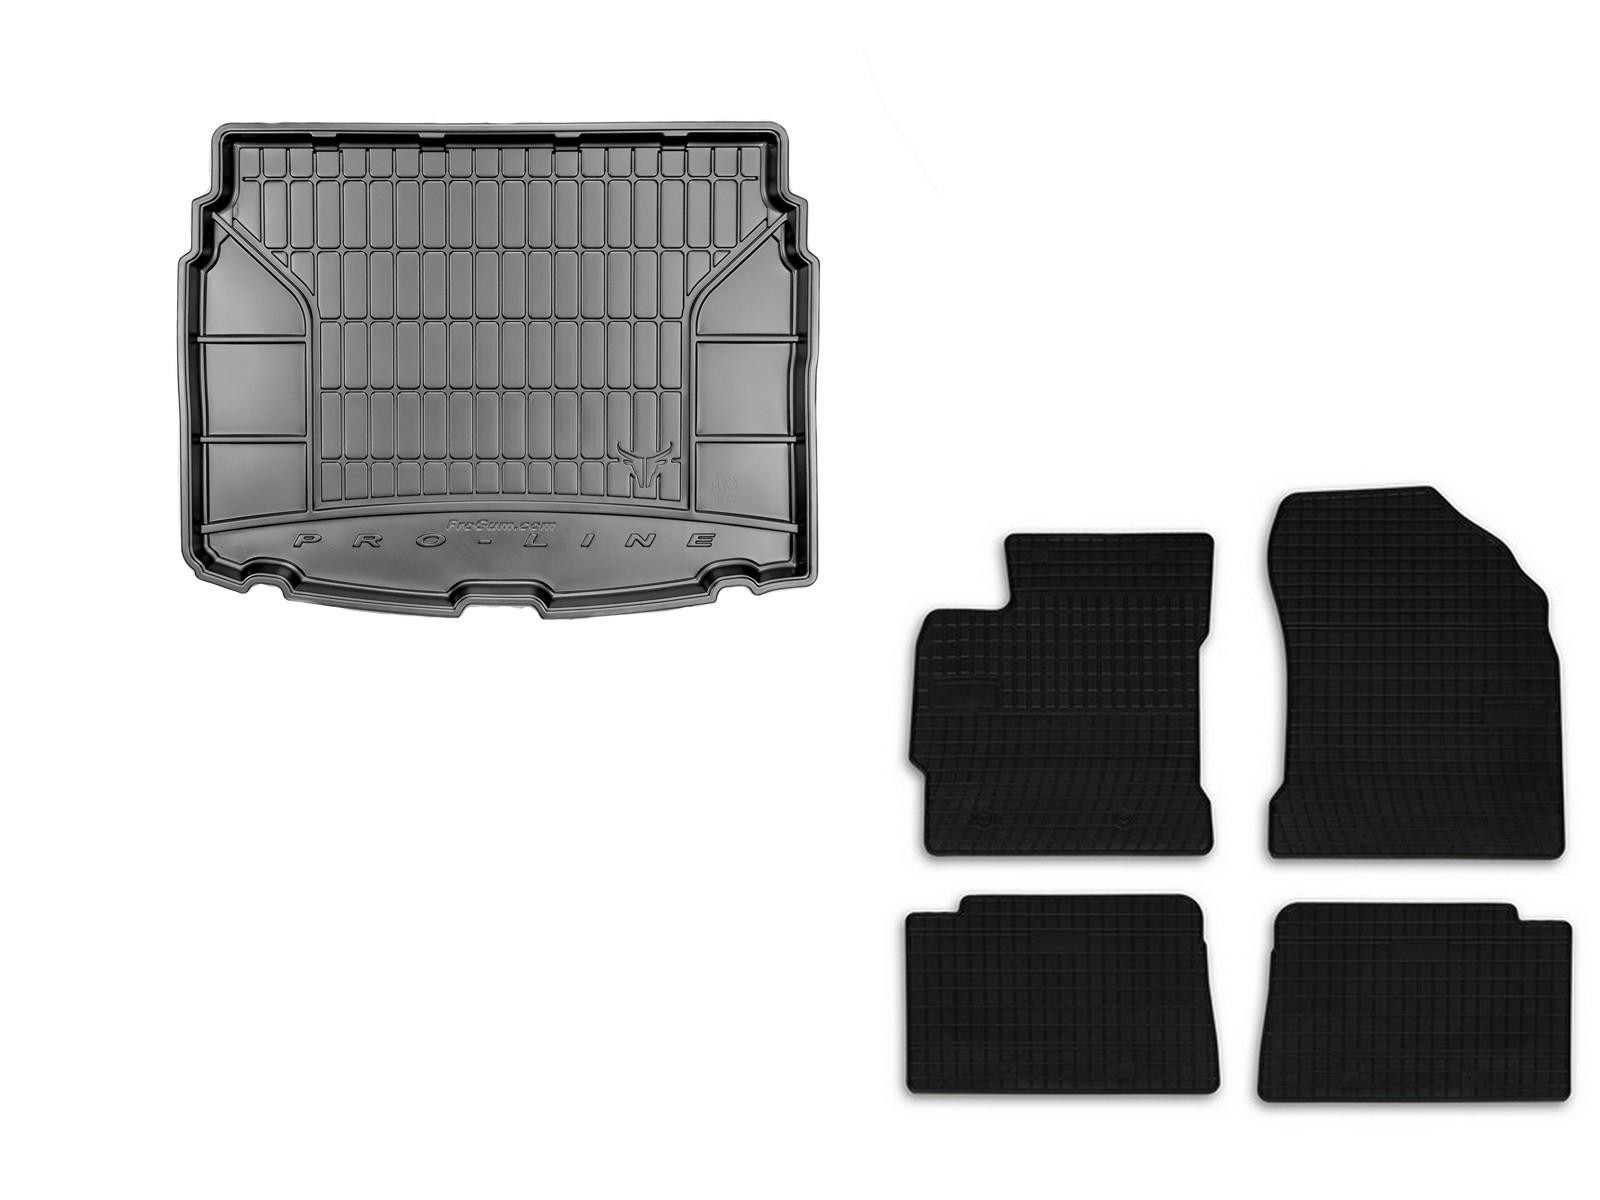 PE Kofferraumwanne SET für Nissan Juke II ab Bj 2014 Gummimatten